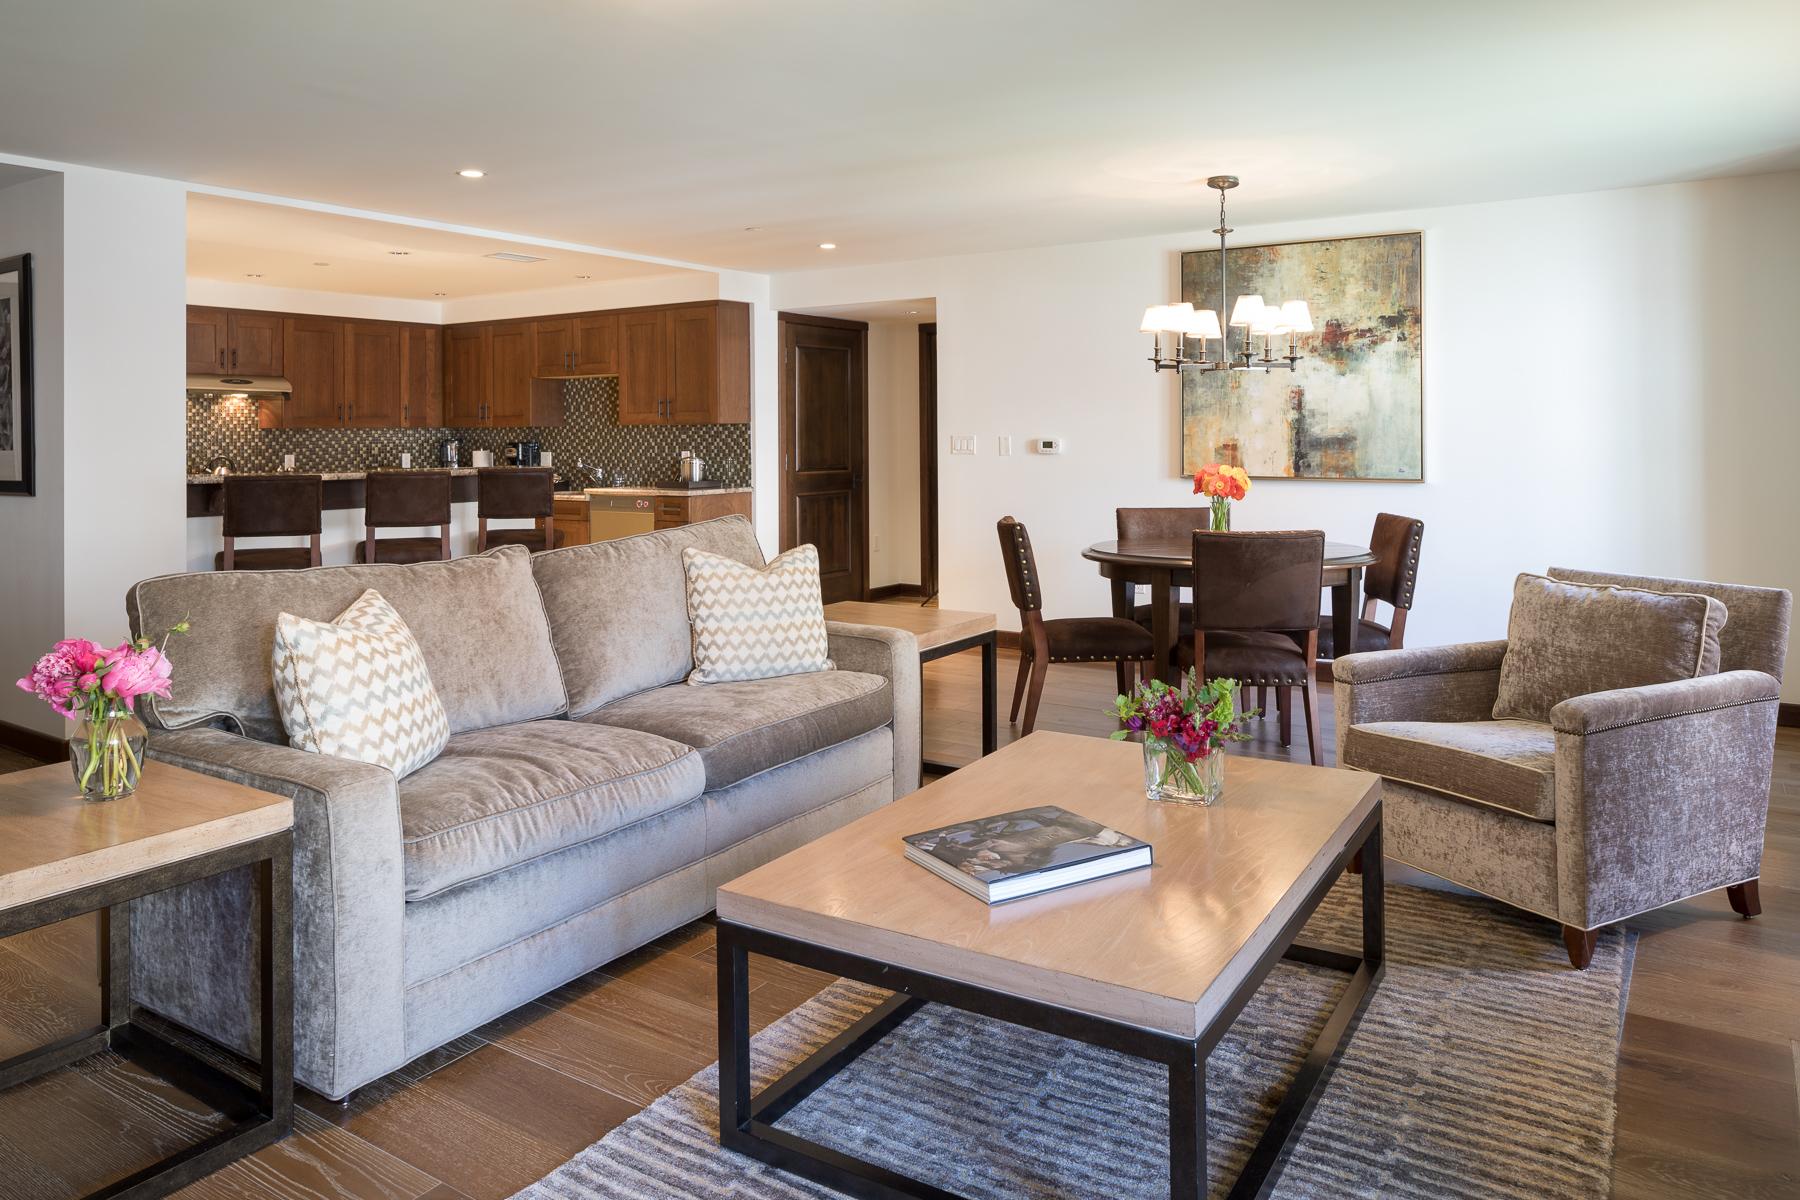 Nhà chung cư vì Bán tại Residence 1203, Madeline Hotel & Residences 568 Mountain Village Boulevard, Residence 1203 Telluride, Colorado, 81435 Hoa Kỳ